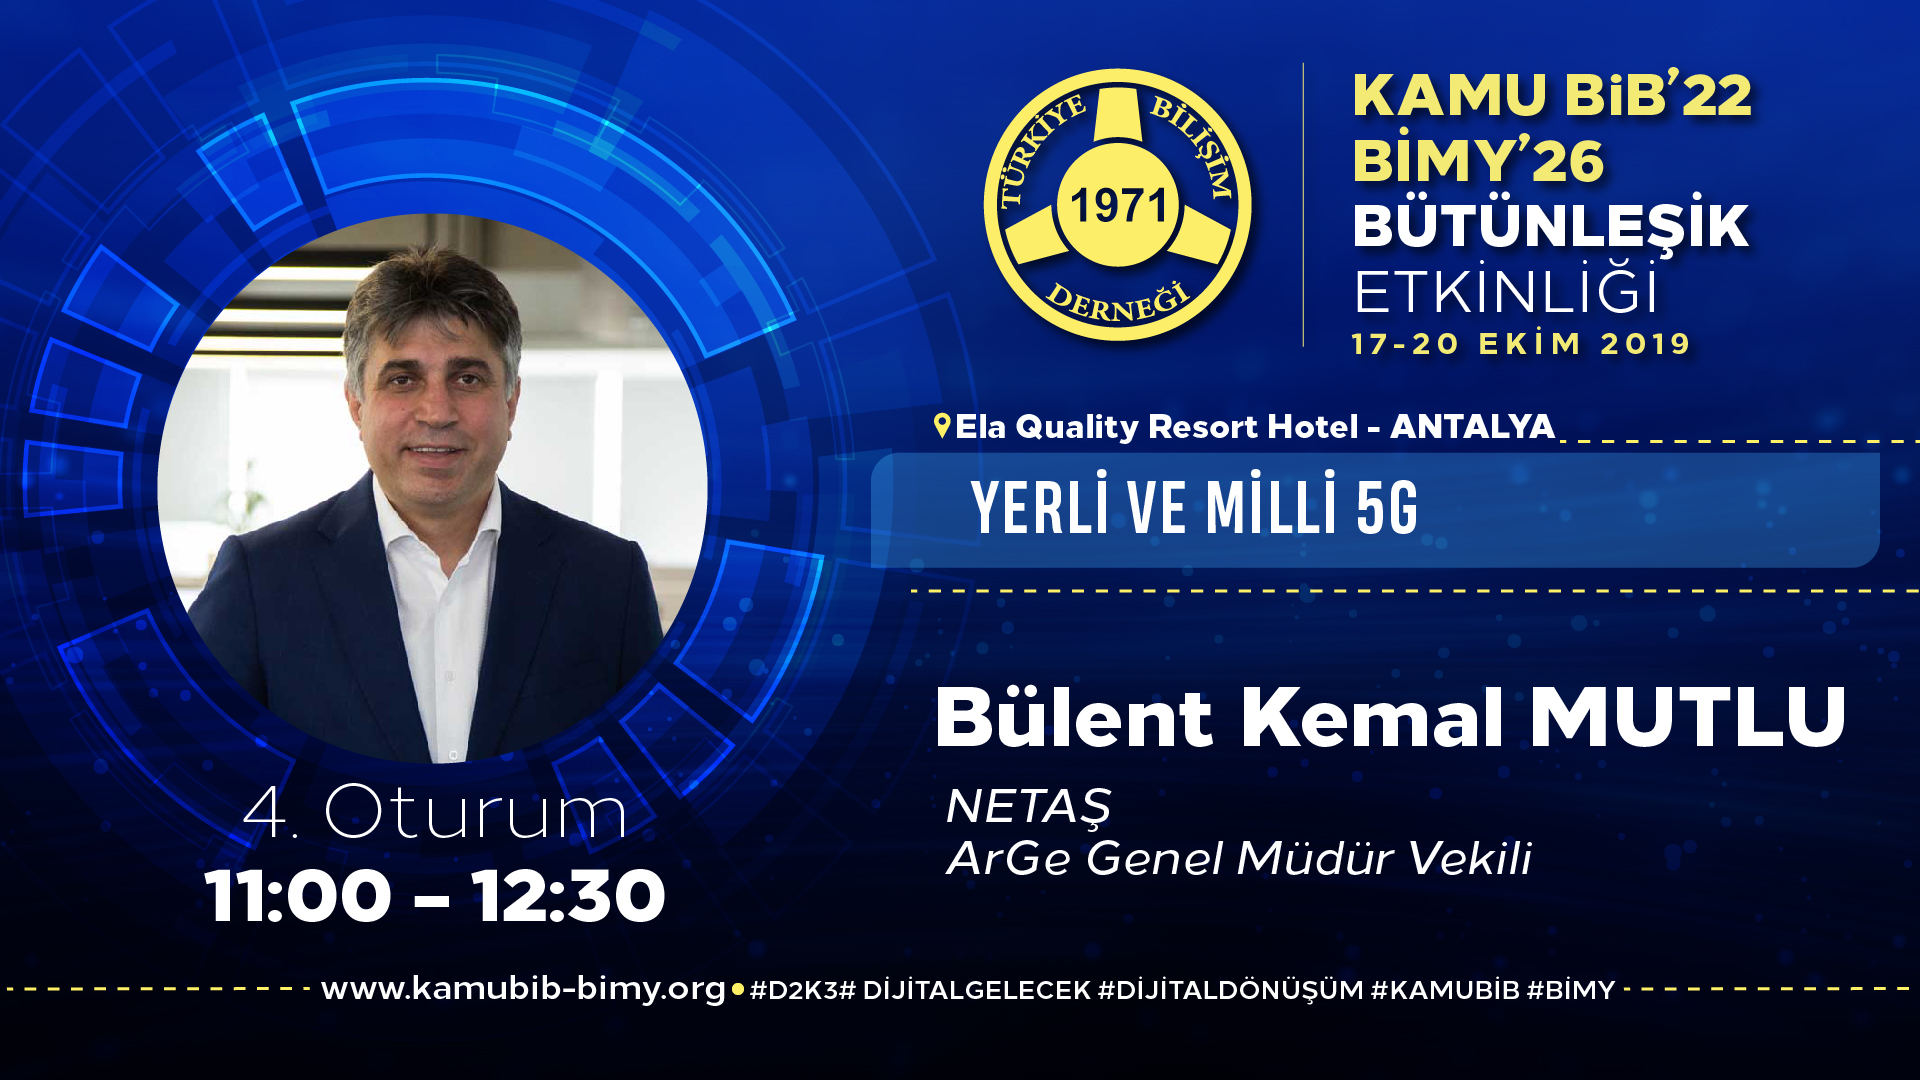 Bülent Kemal MUTLU - KamuBİB'22 BİMY'26